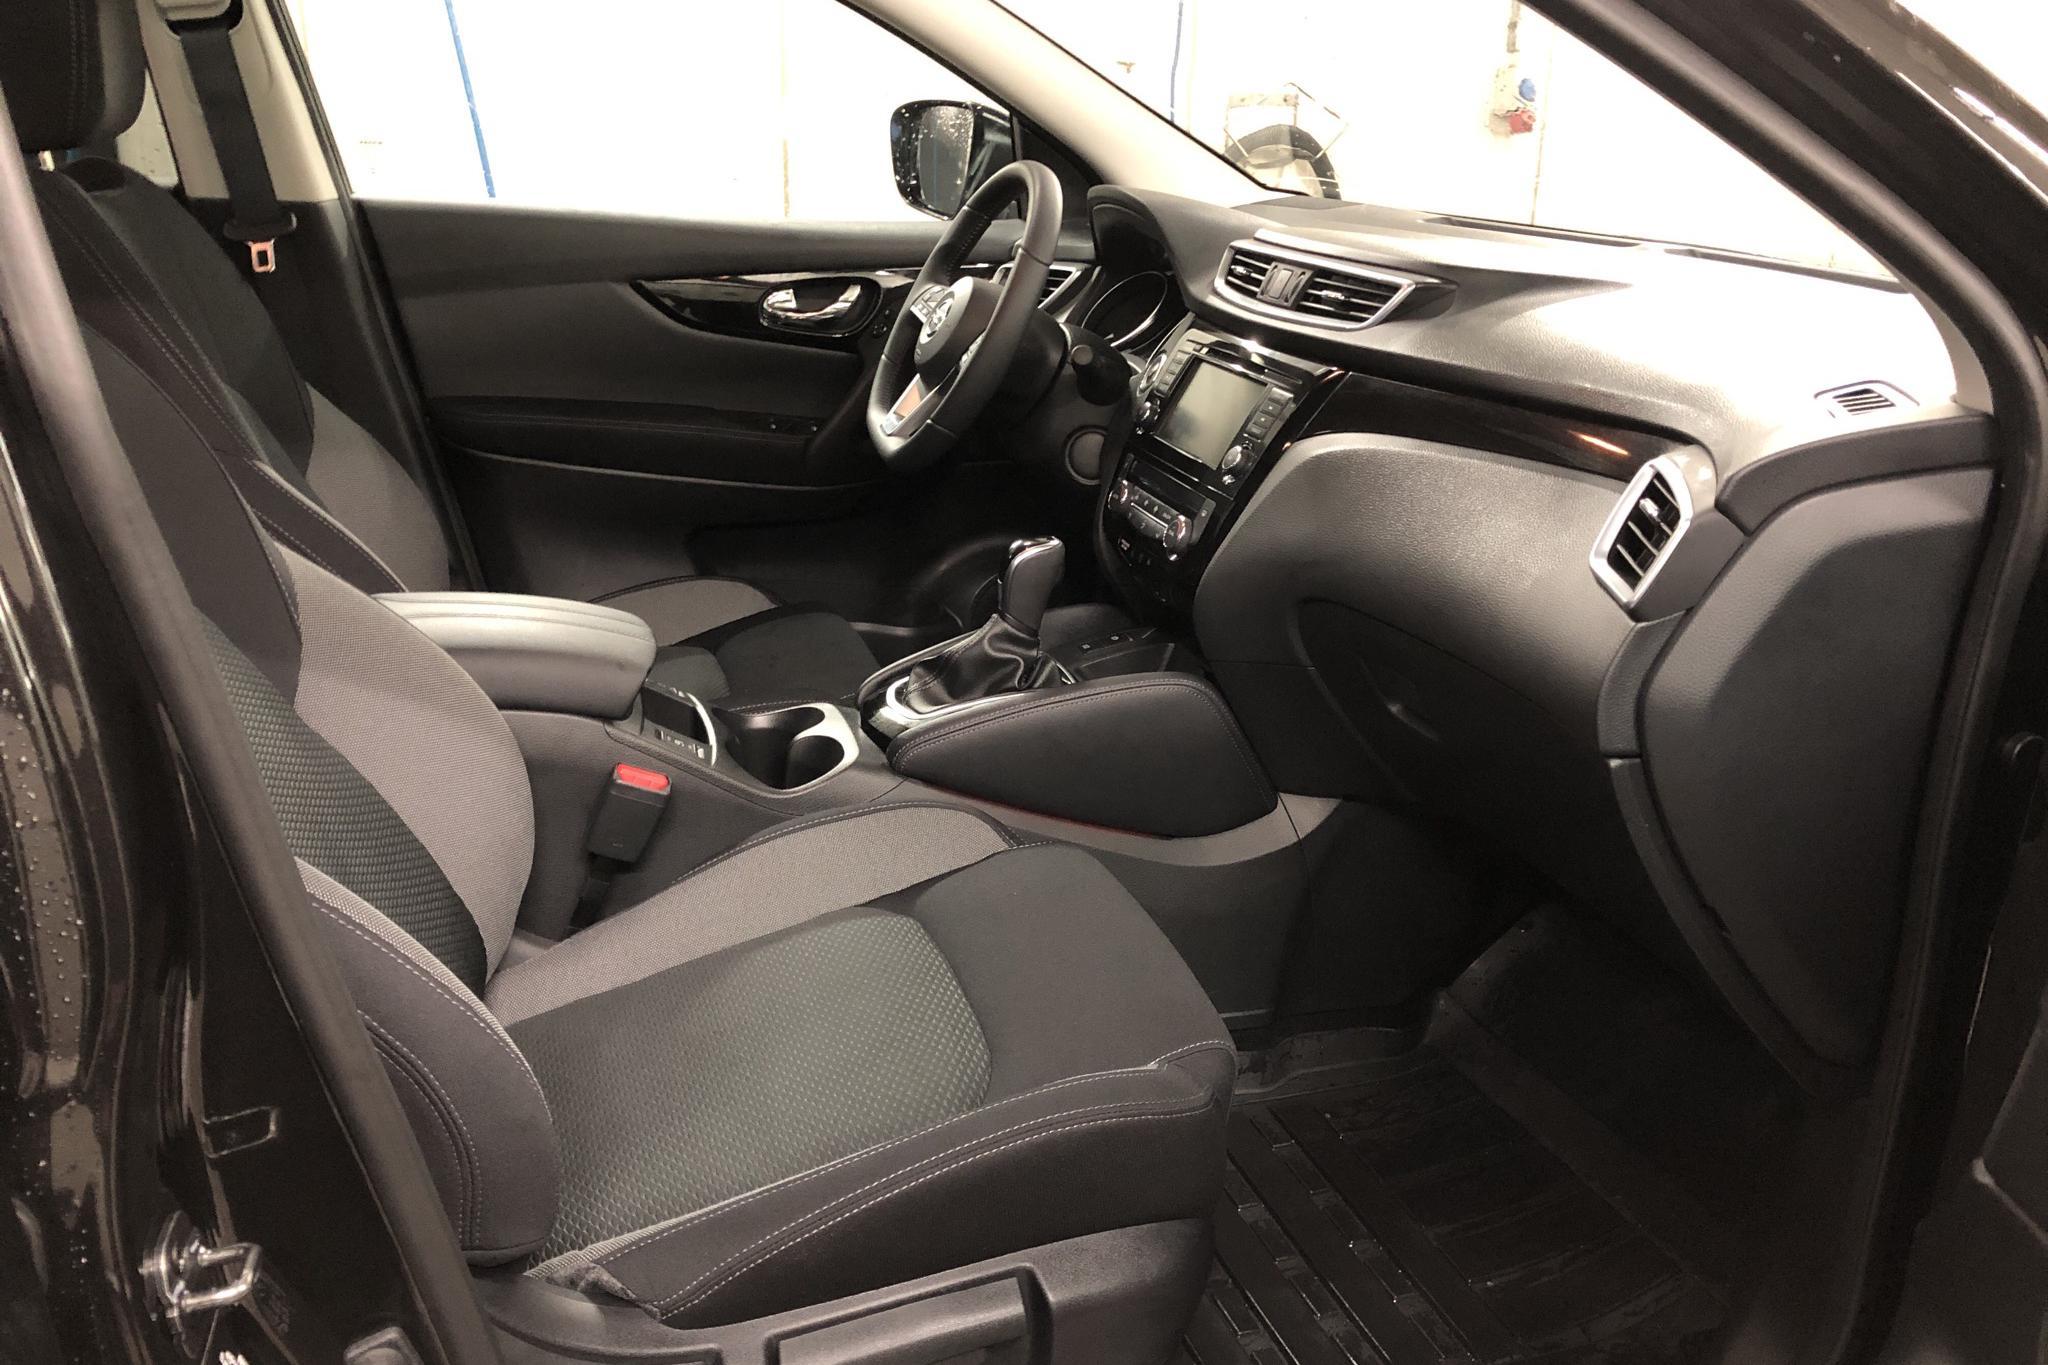 Nissan Qashqai 1.3 DIG-T (160hk) - 12 780 km - Automatic - black - 2020